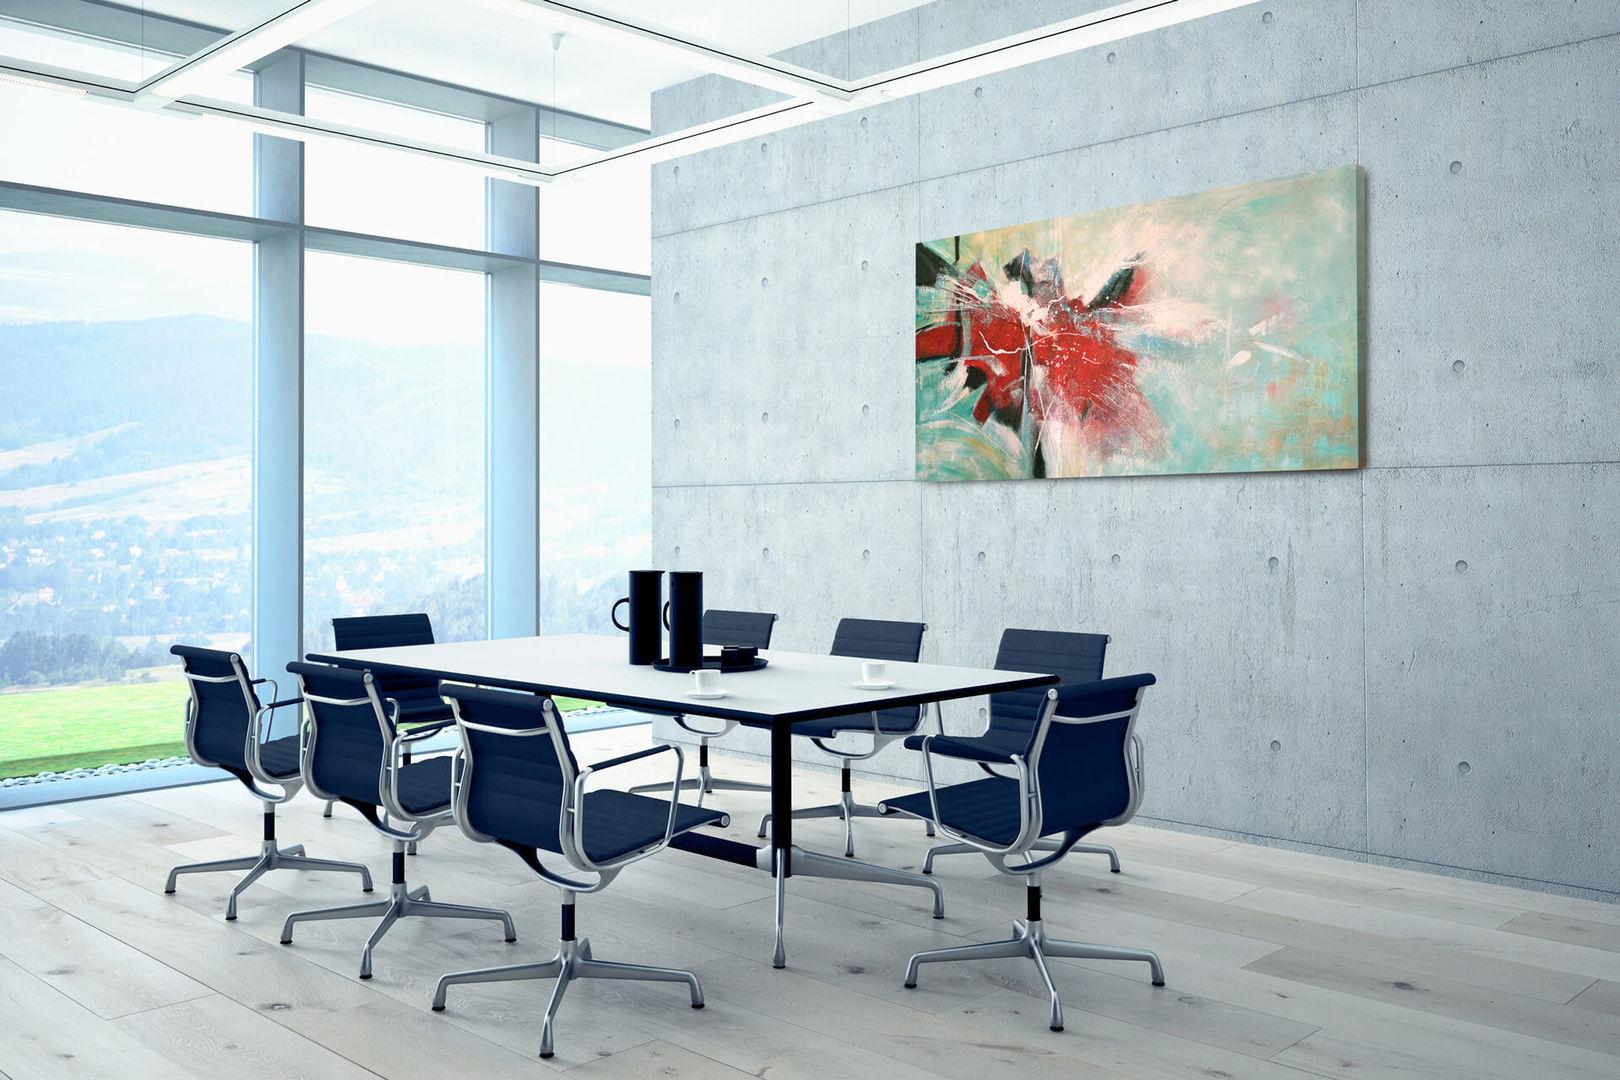 Kl00110 blau rot gruene farbverlaeufe modern abstrakt acryl gemaelde 07